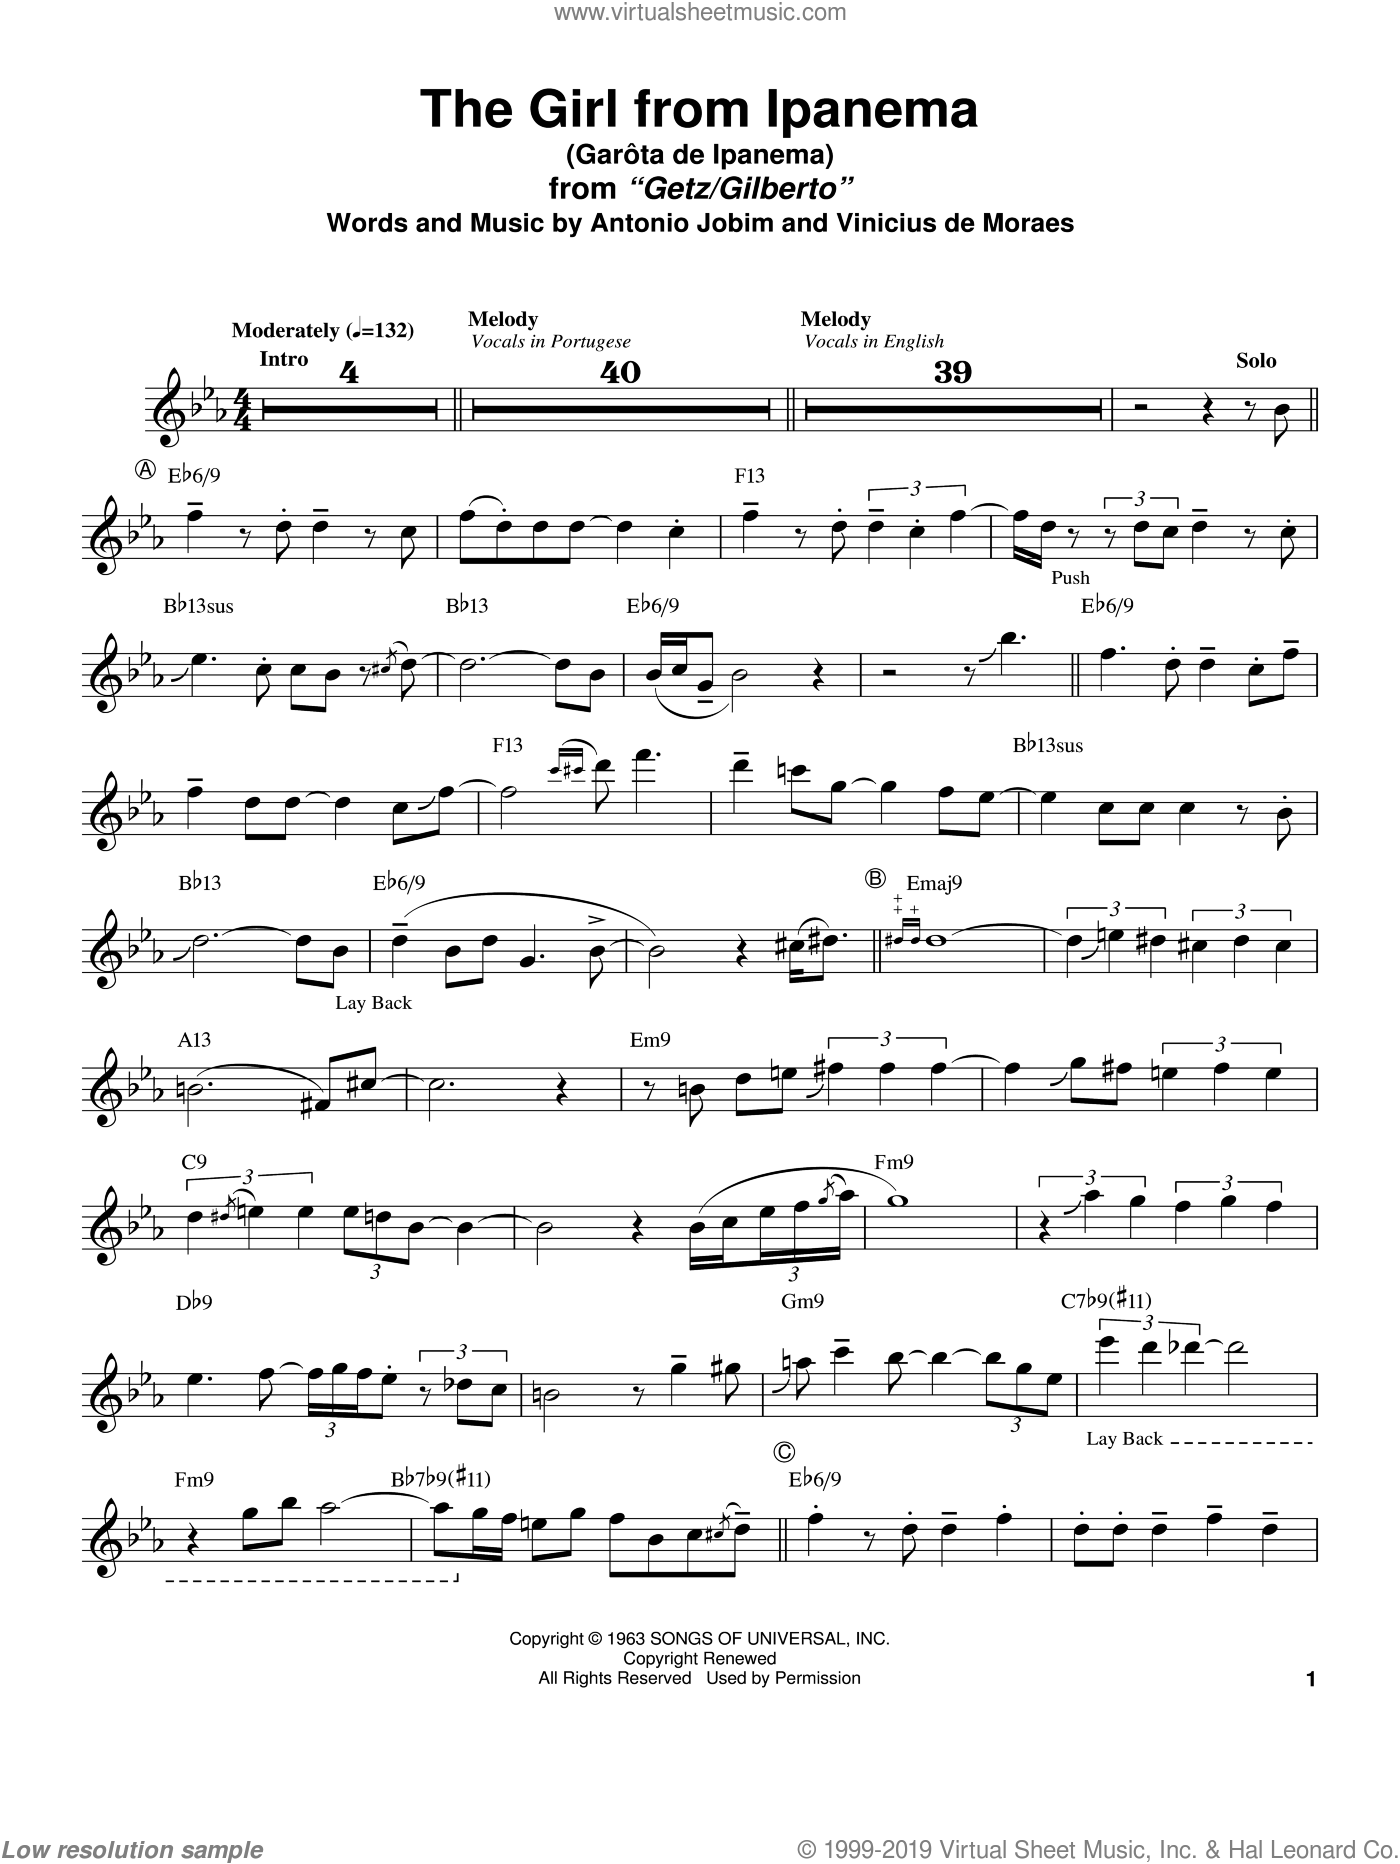 Garota De Ipanema sheet music for tenor saxophone solo (transcription) by Stan Getz, Antonio Jobim and Vinicius de Moraes, intermediate tenor saxophone (transcription)